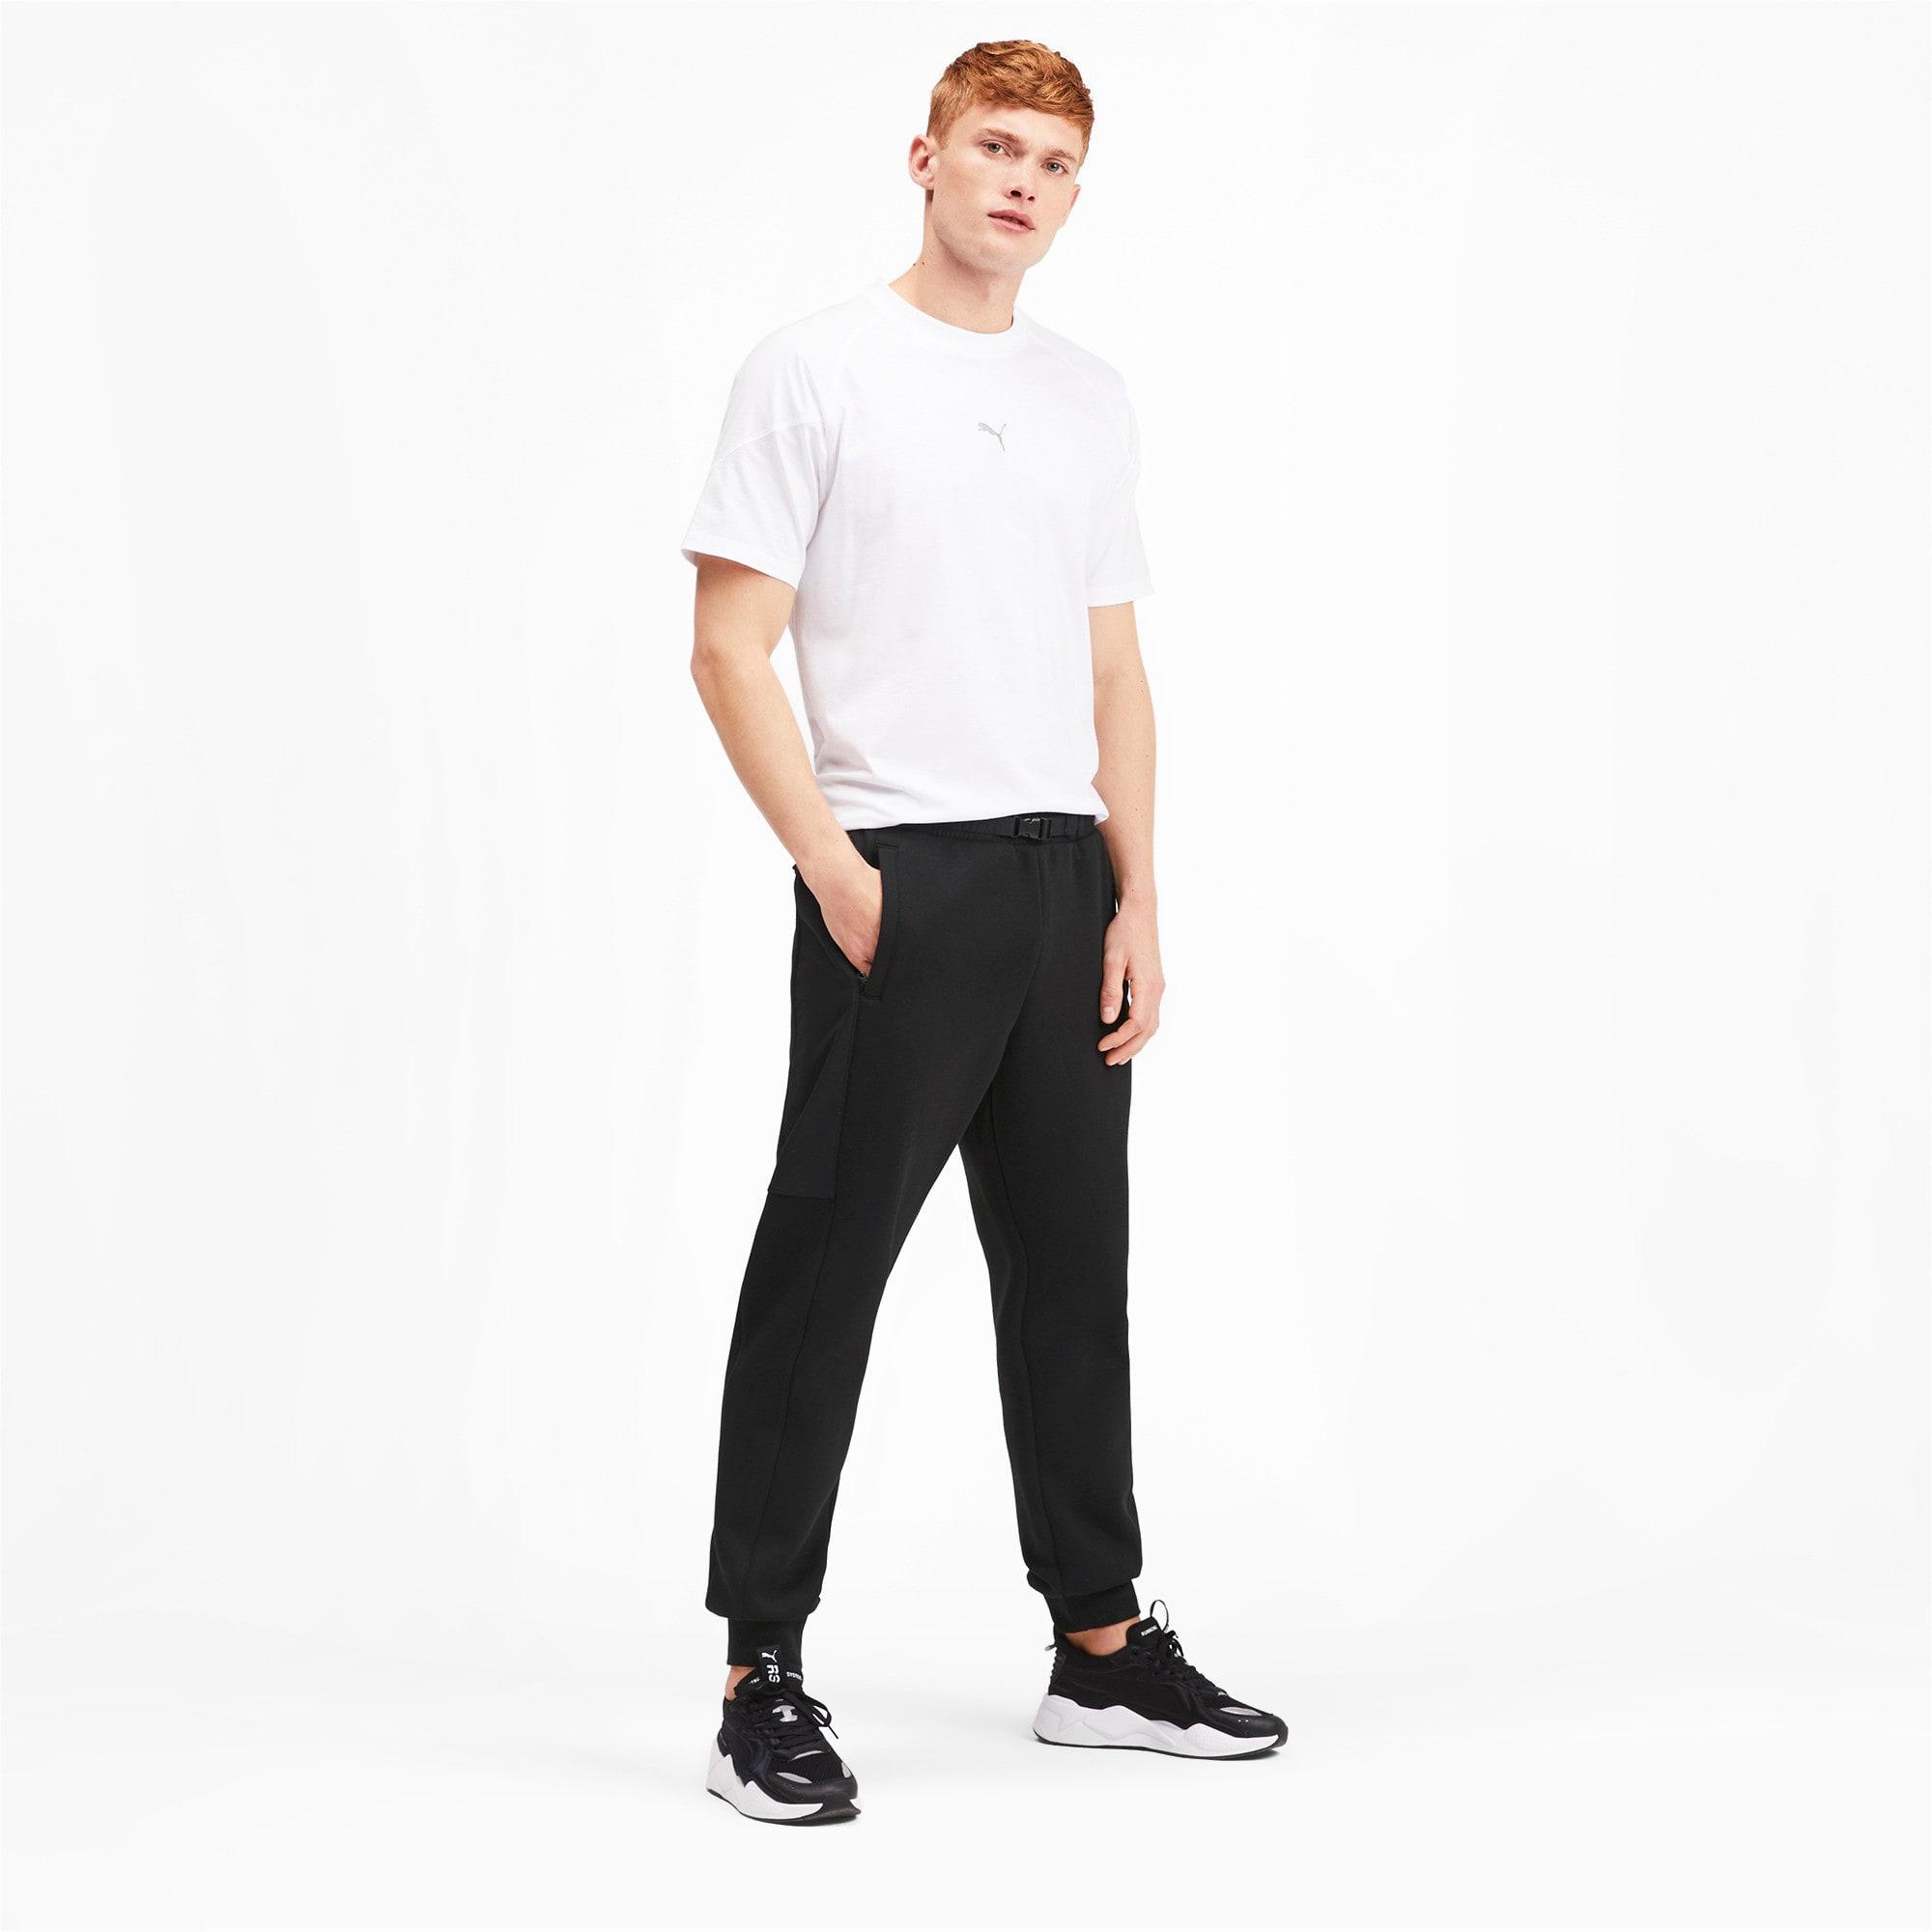 Miniatura 4 de Pantalones deportivos Epoch Hybrid para hombre, Puma Black, mediano